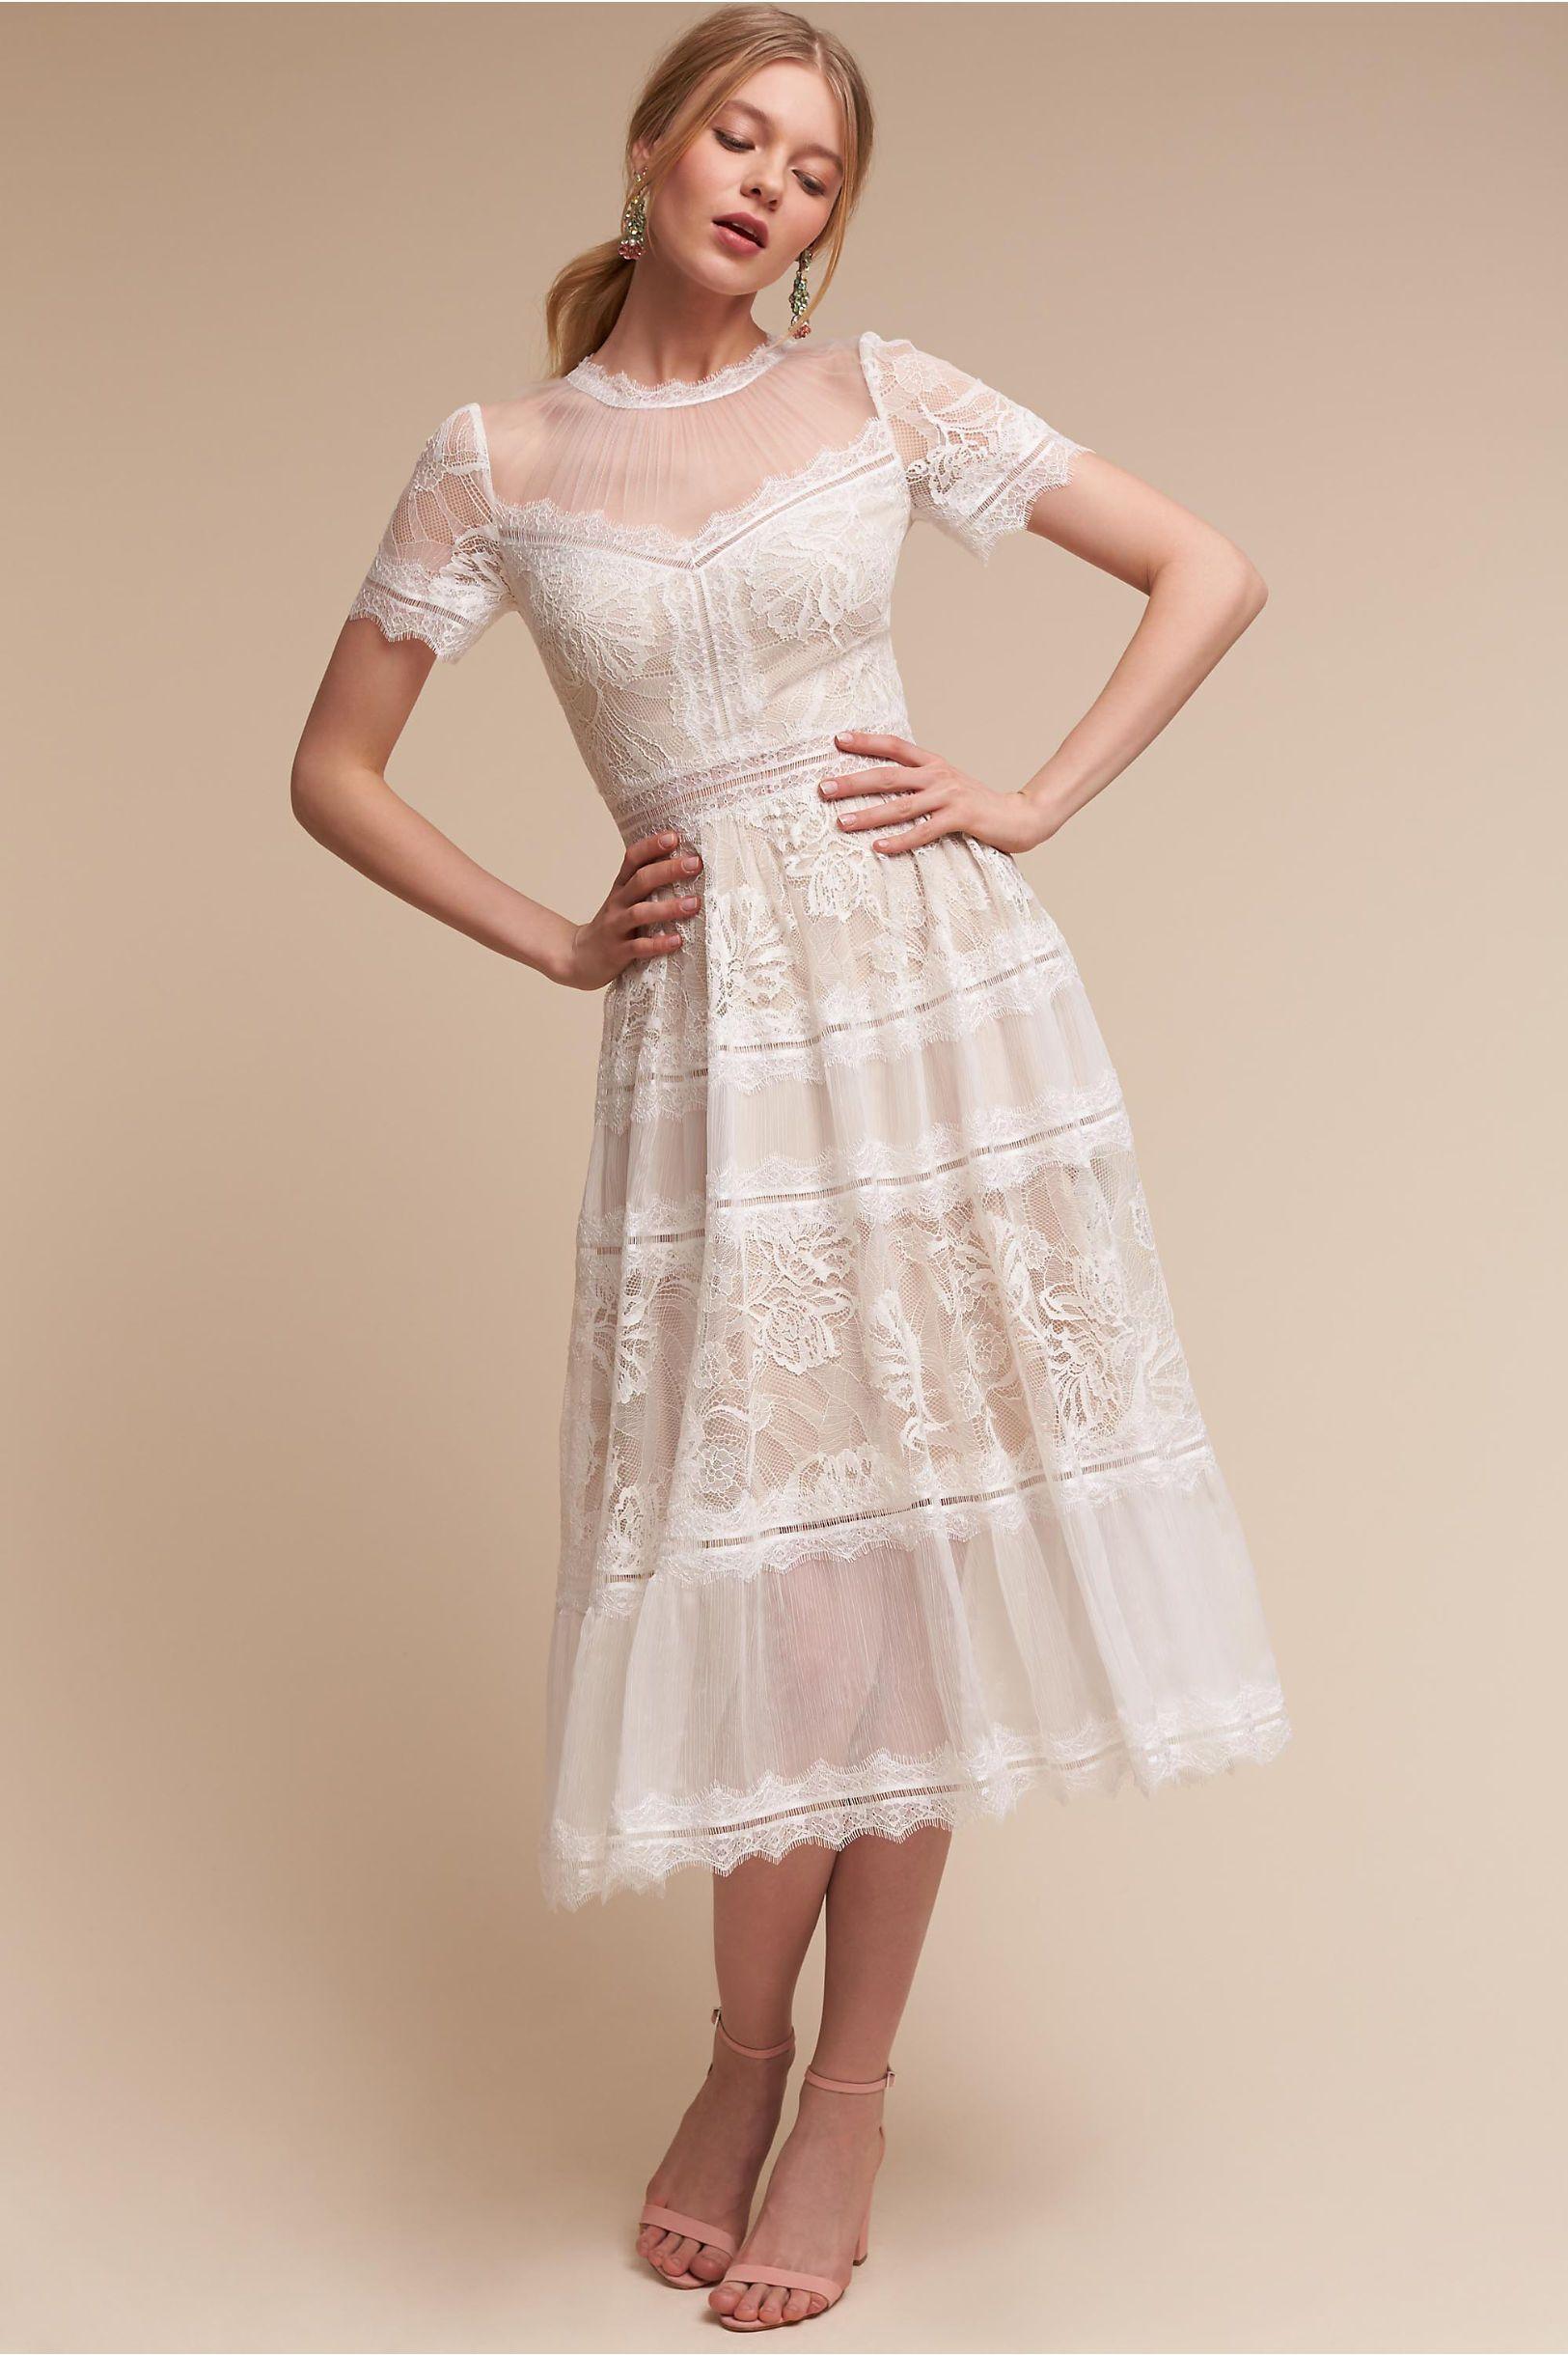 Alicia Heels | women\'s evening dresses | Pinterest | Tadashi shoji ...